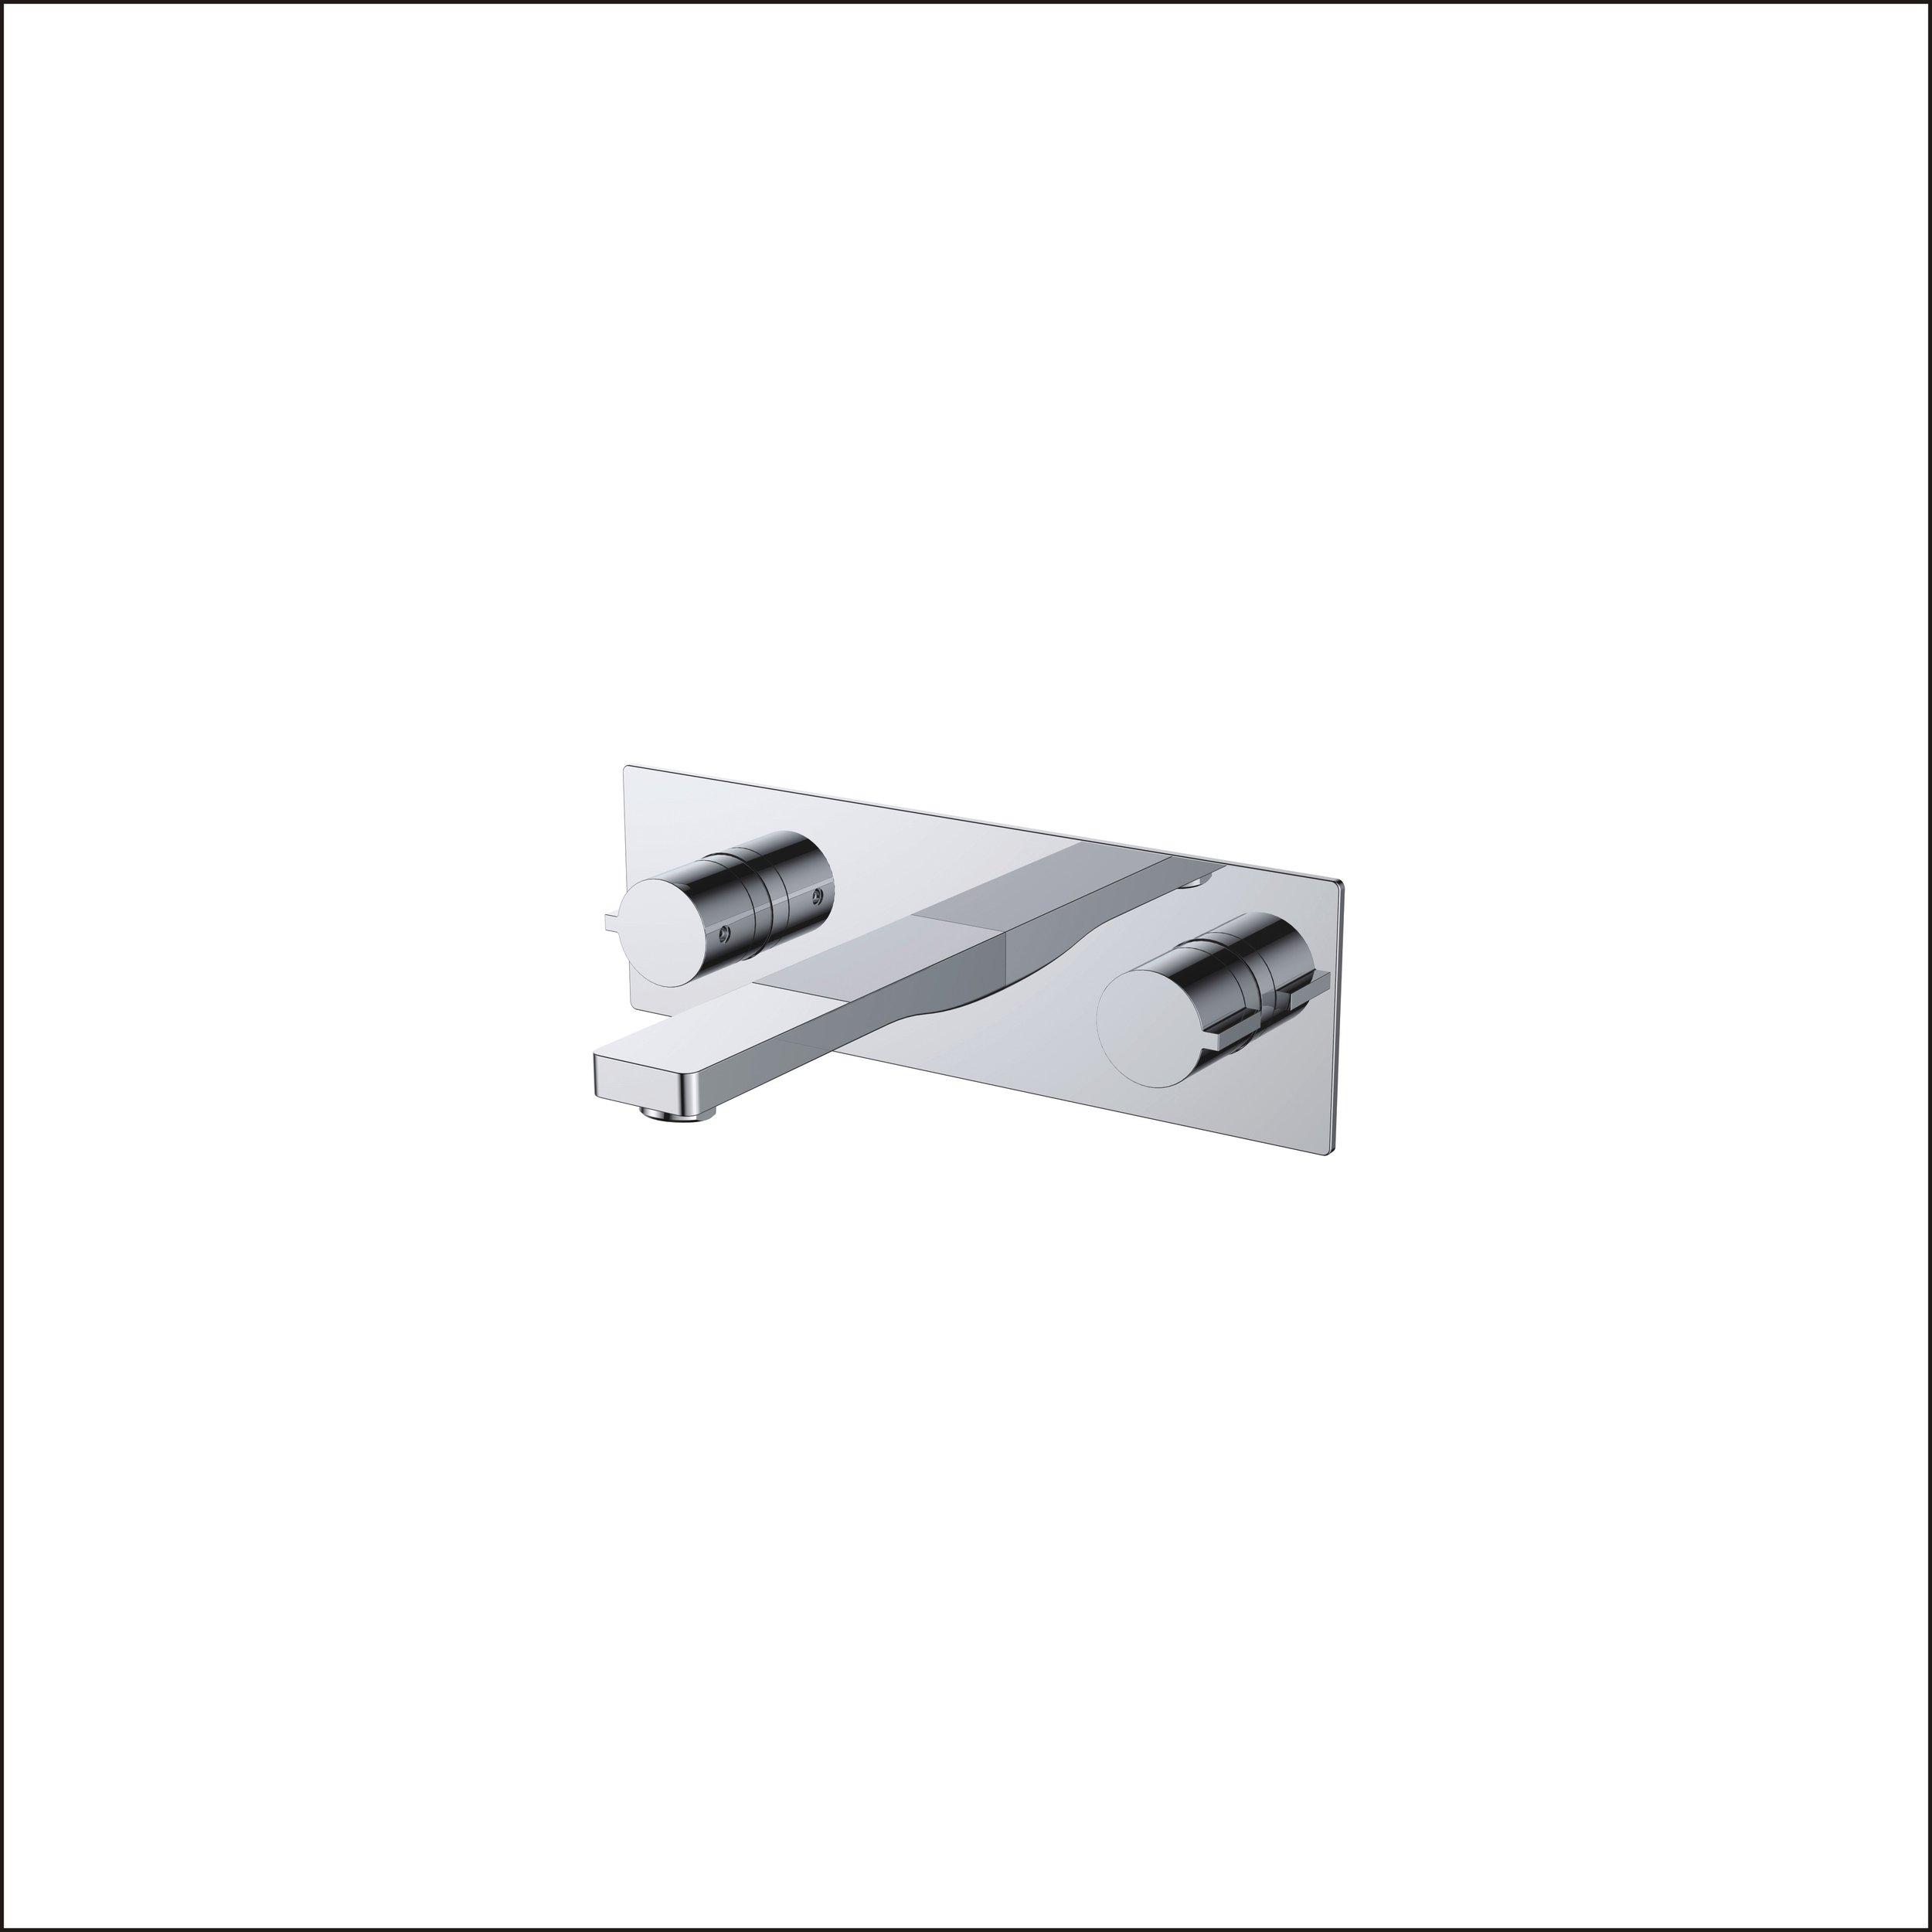 718-107:Wall mounted bath faucet